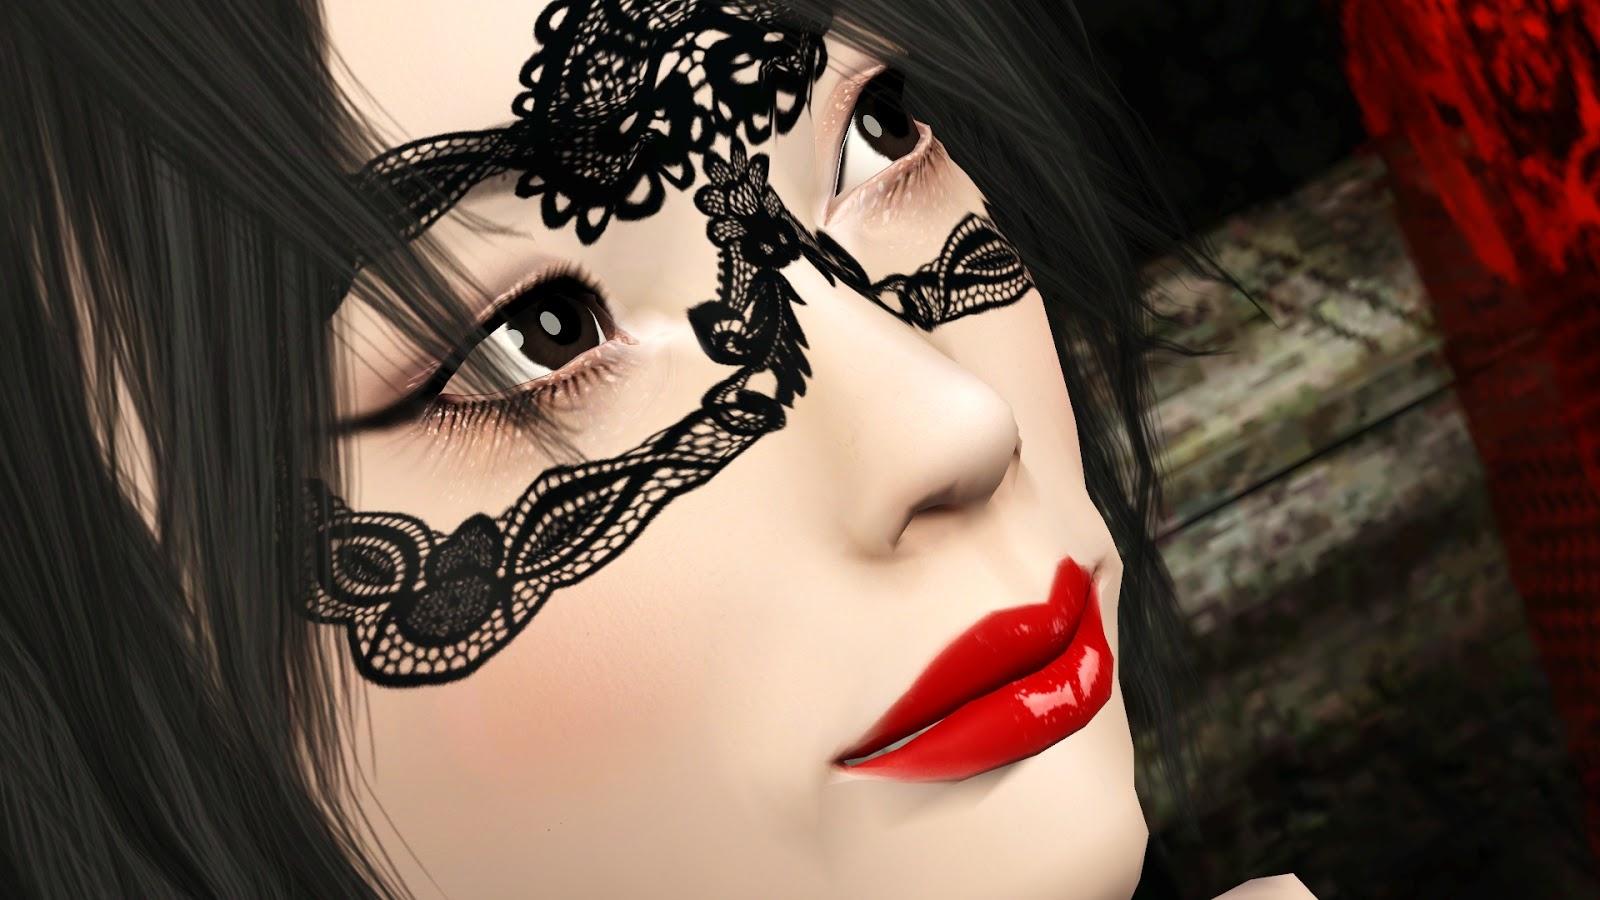 http://thomasjchee.blogspot.com.au/p/takahatsu-black-queen_19.html